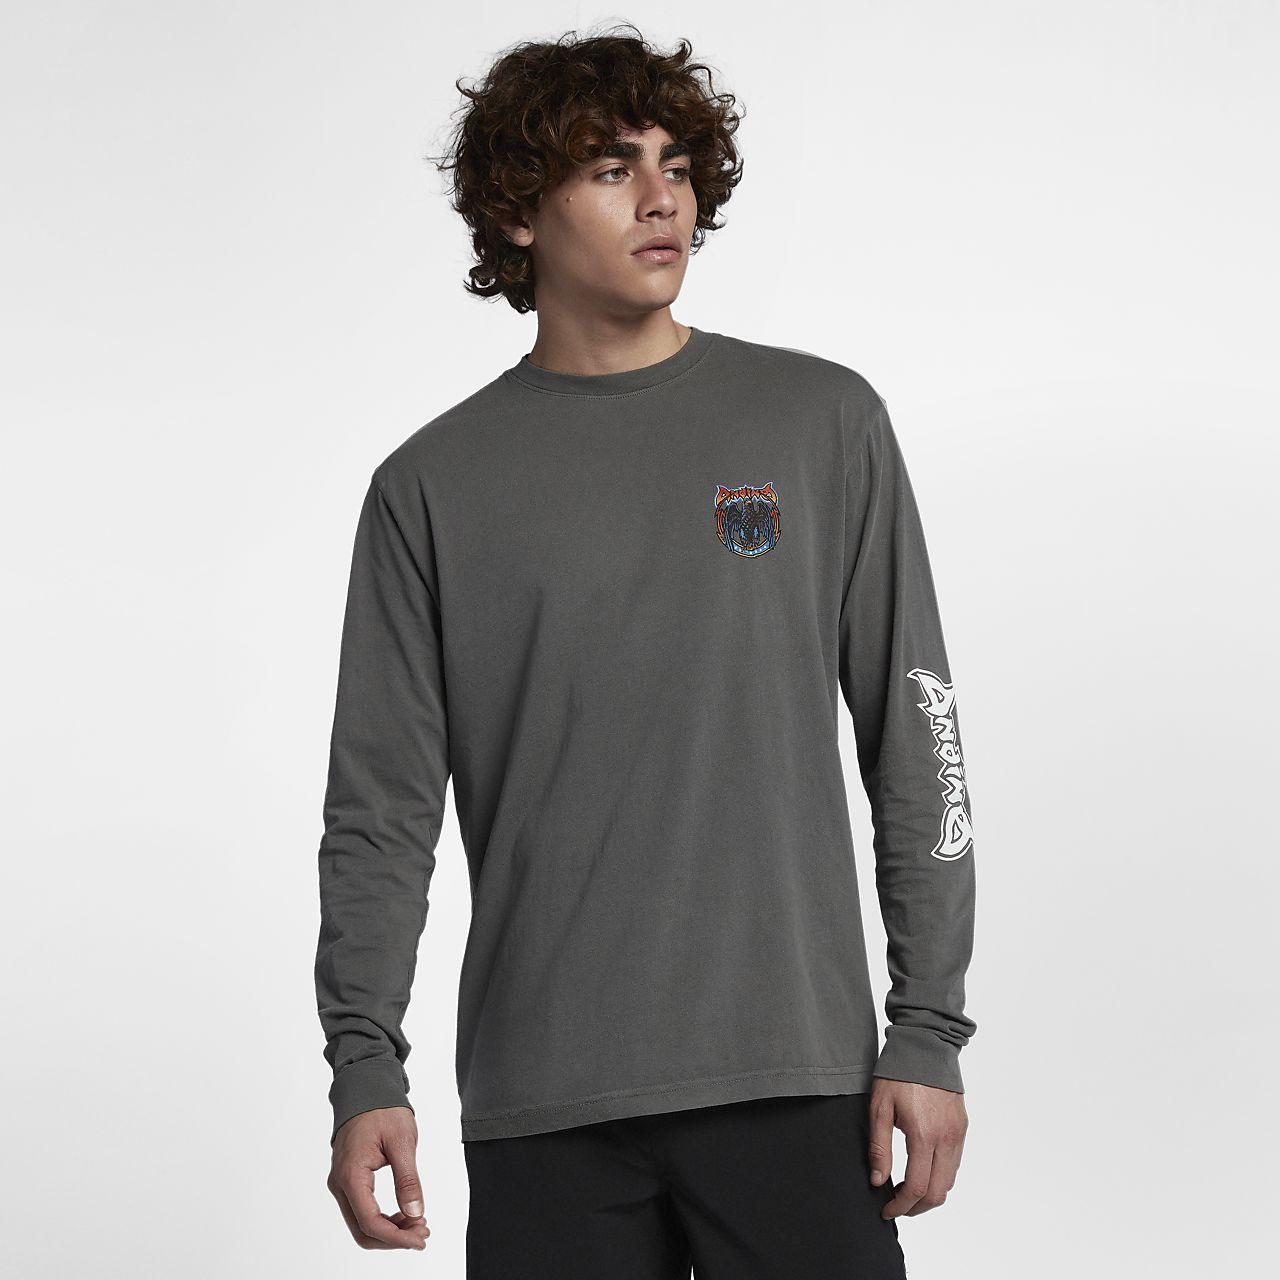 92e454db76 Hurley Team Andino Men's Long Sleeve T-Shirt